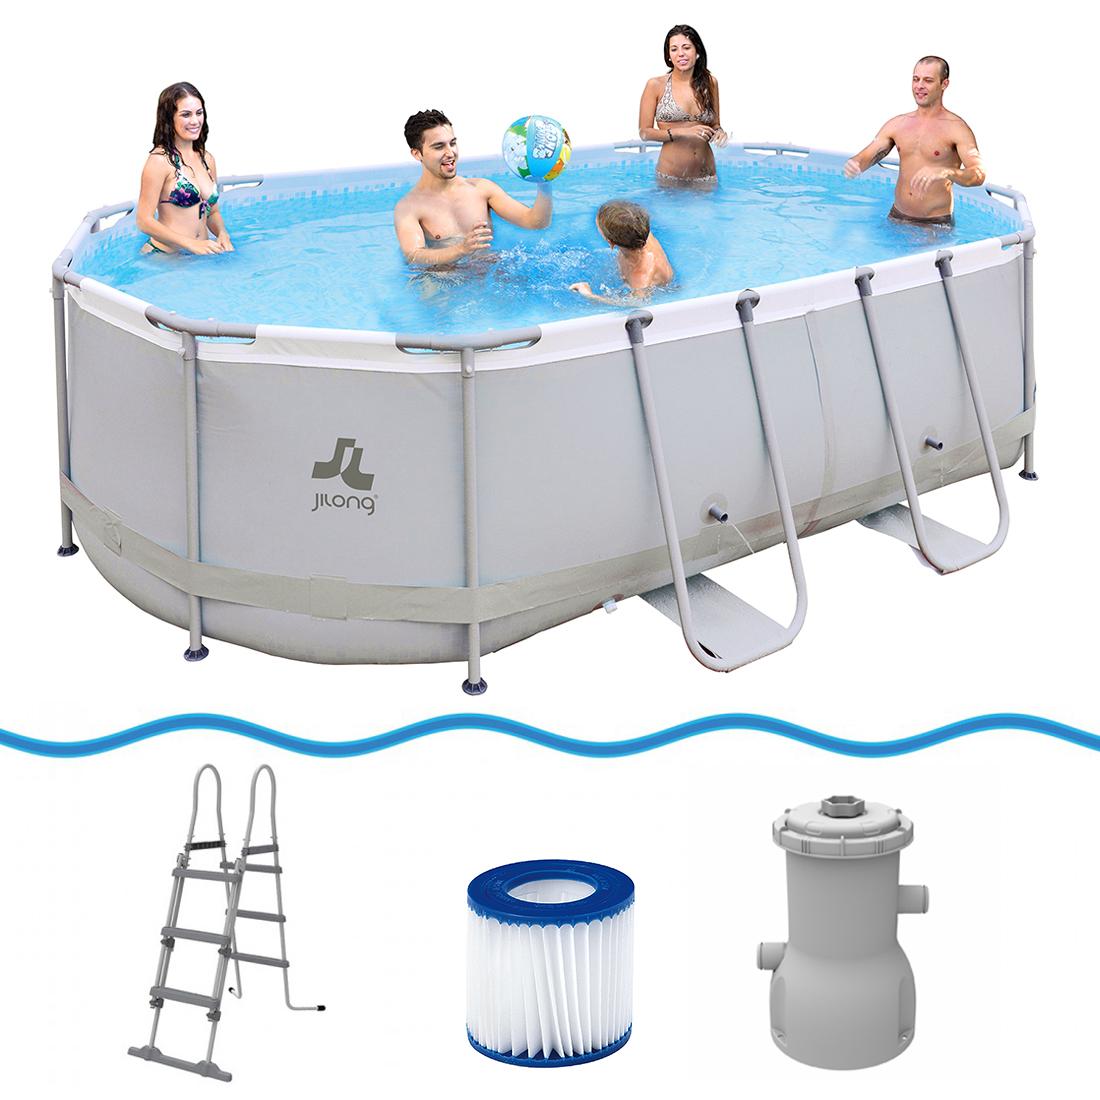 Jilong Oval Swimming Pool Set Passaat Grey - Schwimmbad 427x275x100 ...